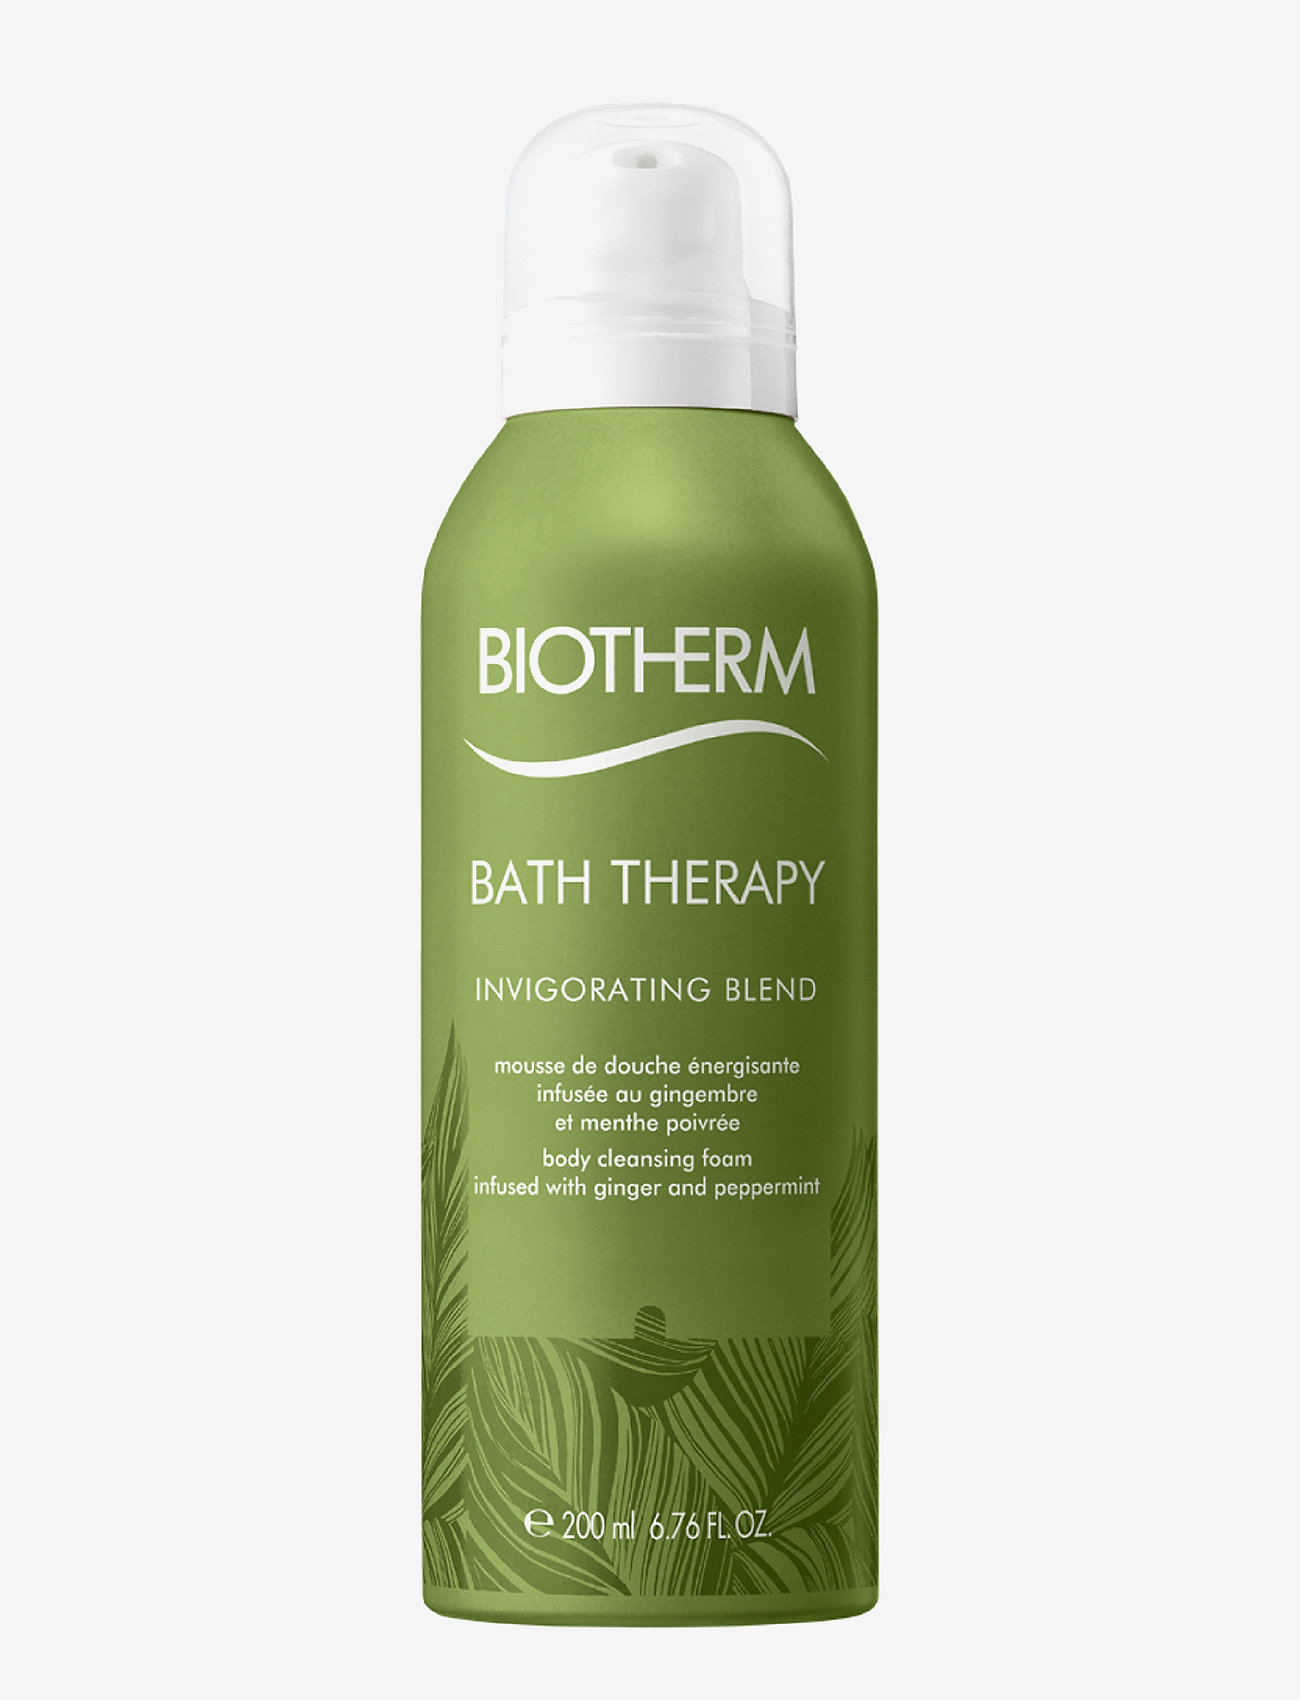 Biotherm - Bath Therapy Invigorating Blend Foam  50 ml - shower gel - clear - 1